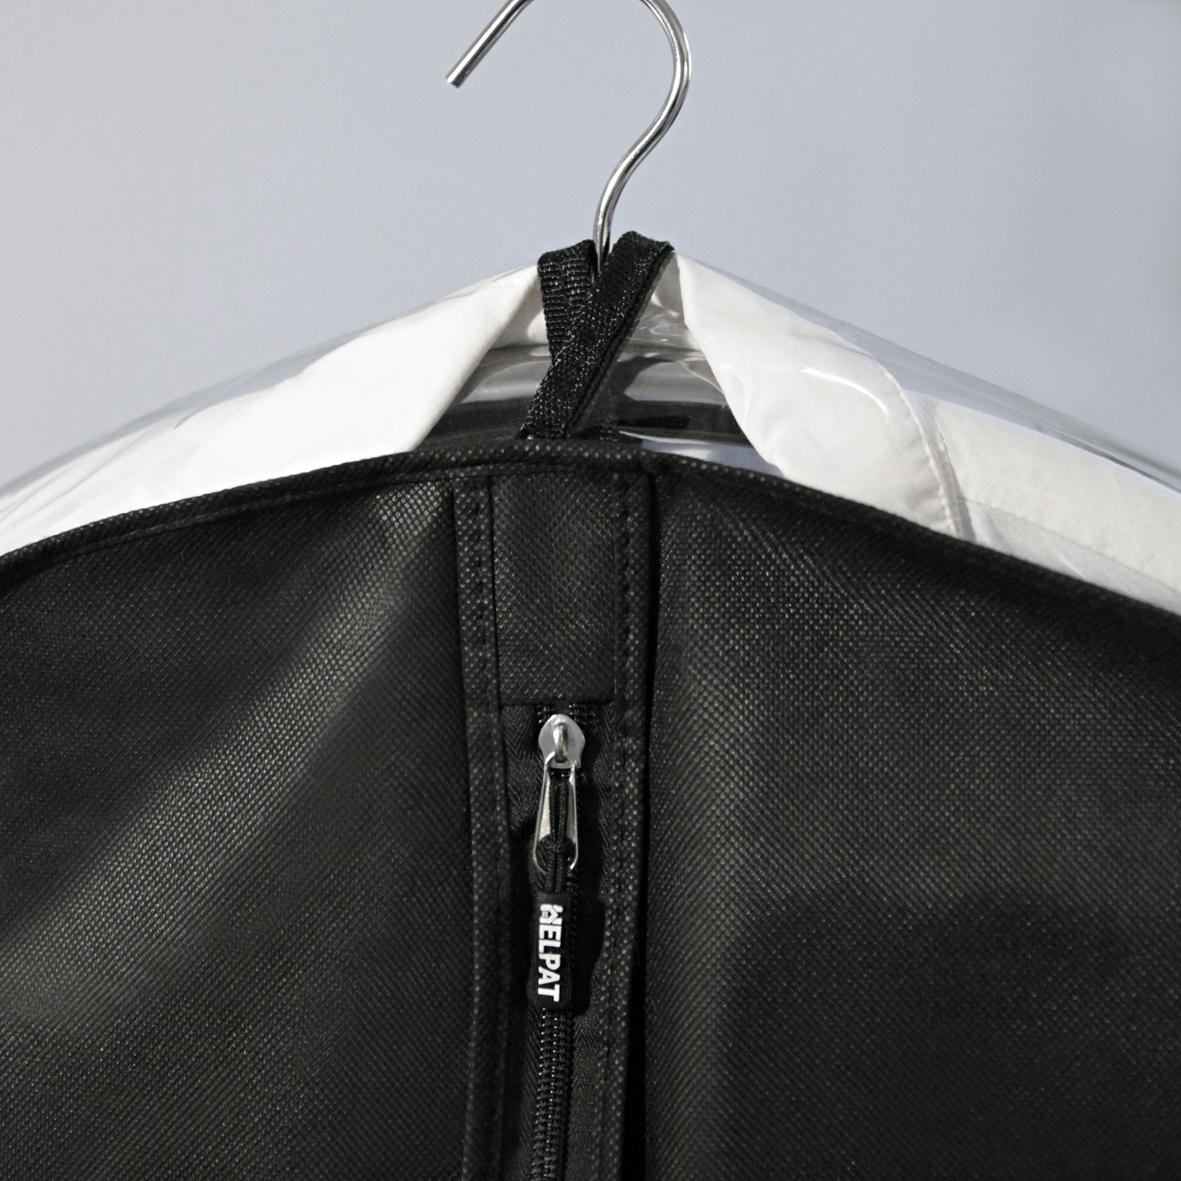 6_Kleidersack_PVC_Seite_100cm